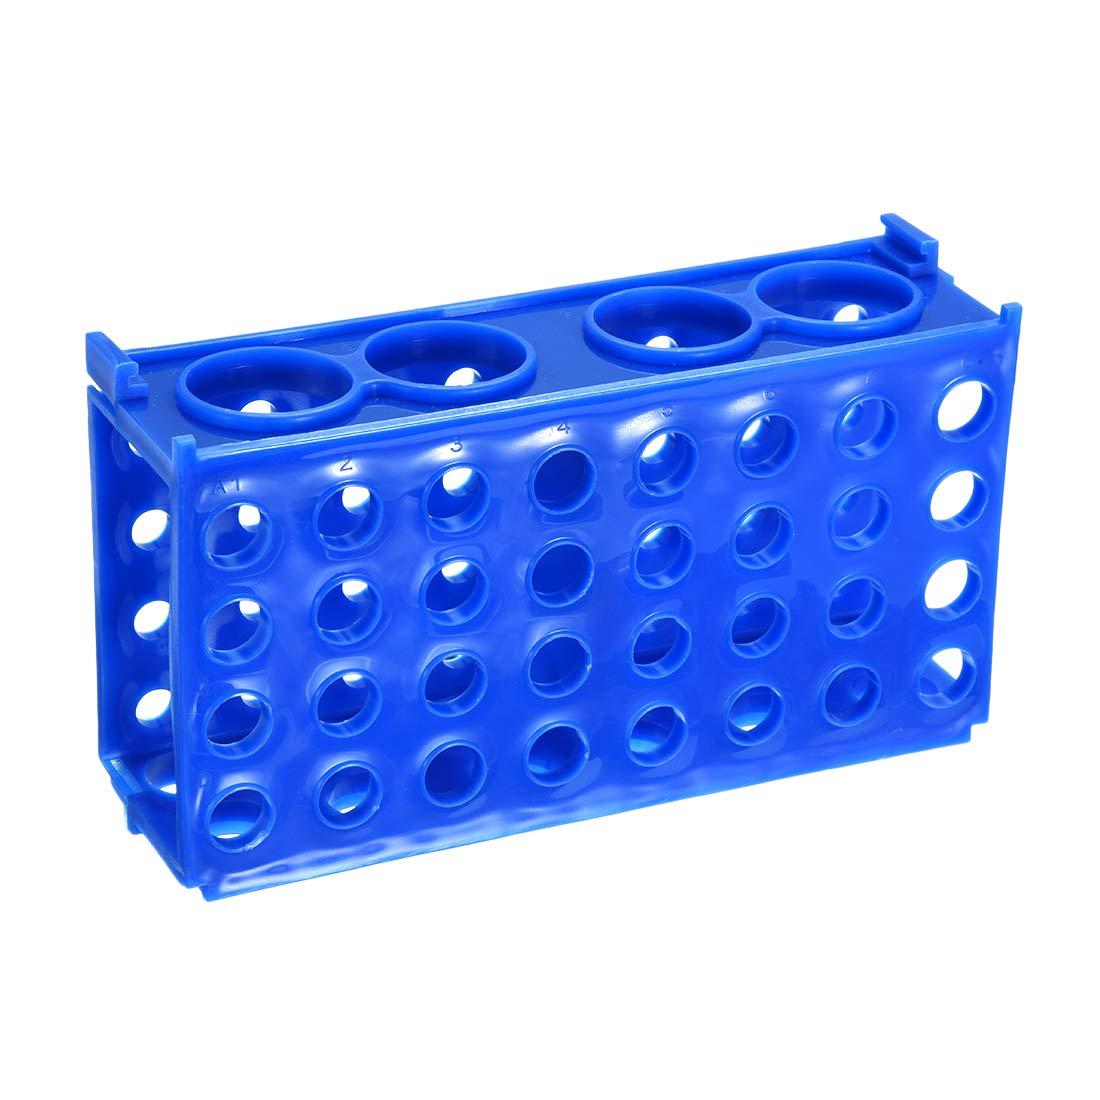 uxcell 2 Pcs 4 Way Tube Rack Polypropylene 80-Well Blue for 0.5ml, 1.5ml, 1.8ml, 10ml, 15ml, 50ml